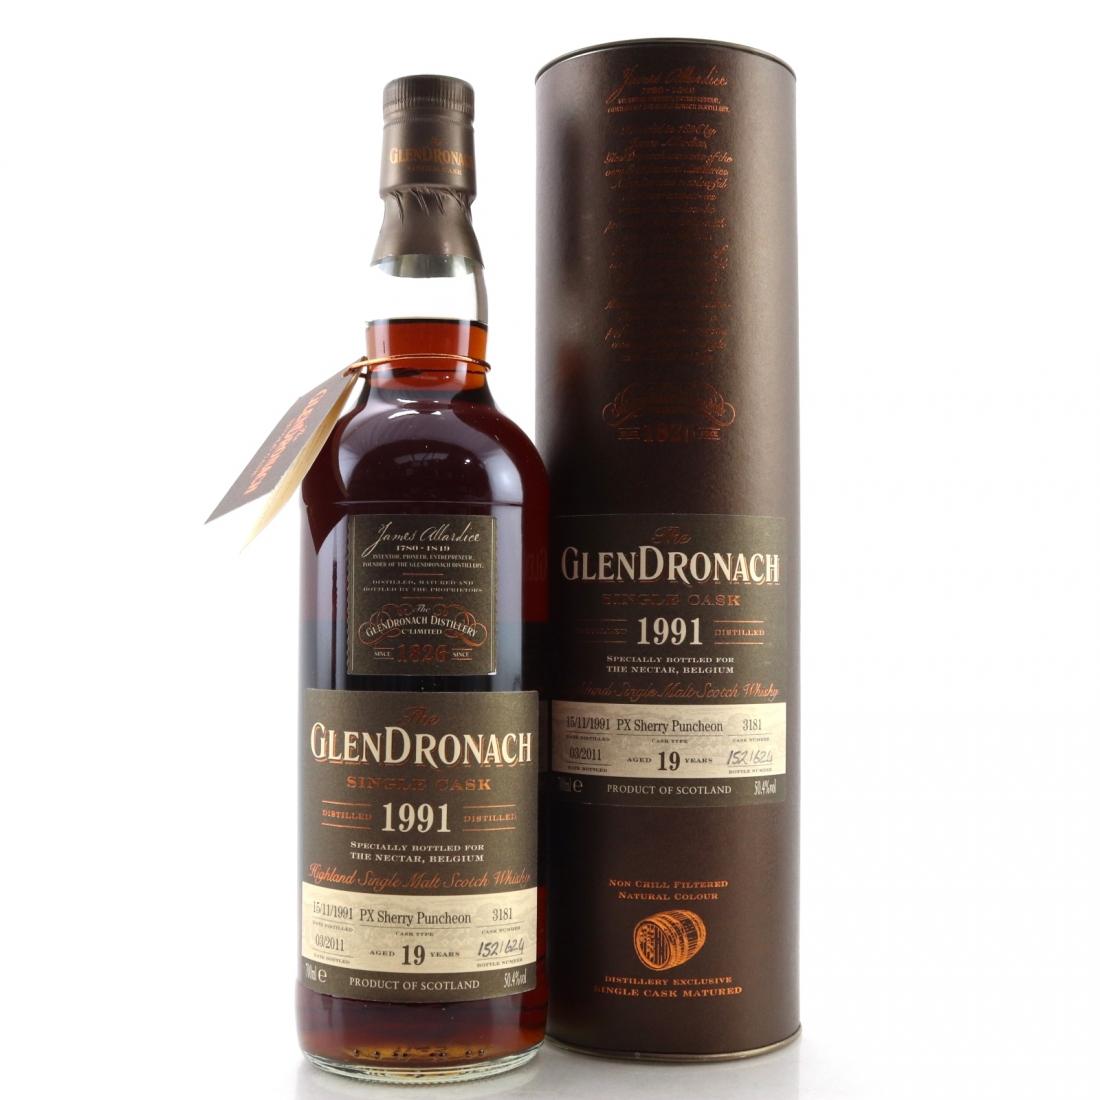 Glendronach 1991 Single Cask 19 Year Old #3181